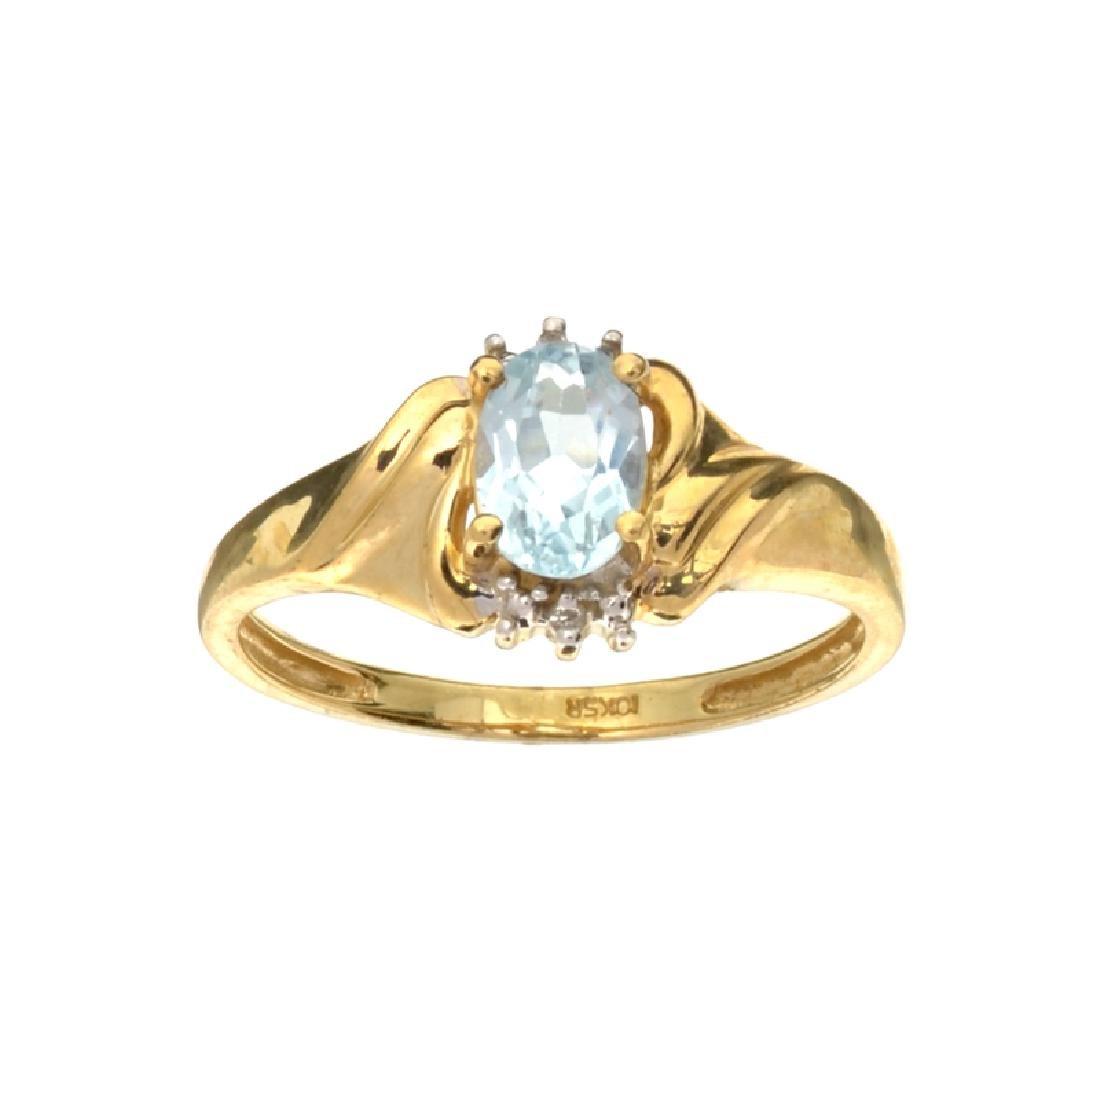 APP: 1k Fine Jewelry 10kt. Yellow/White Gold, 0.70CT